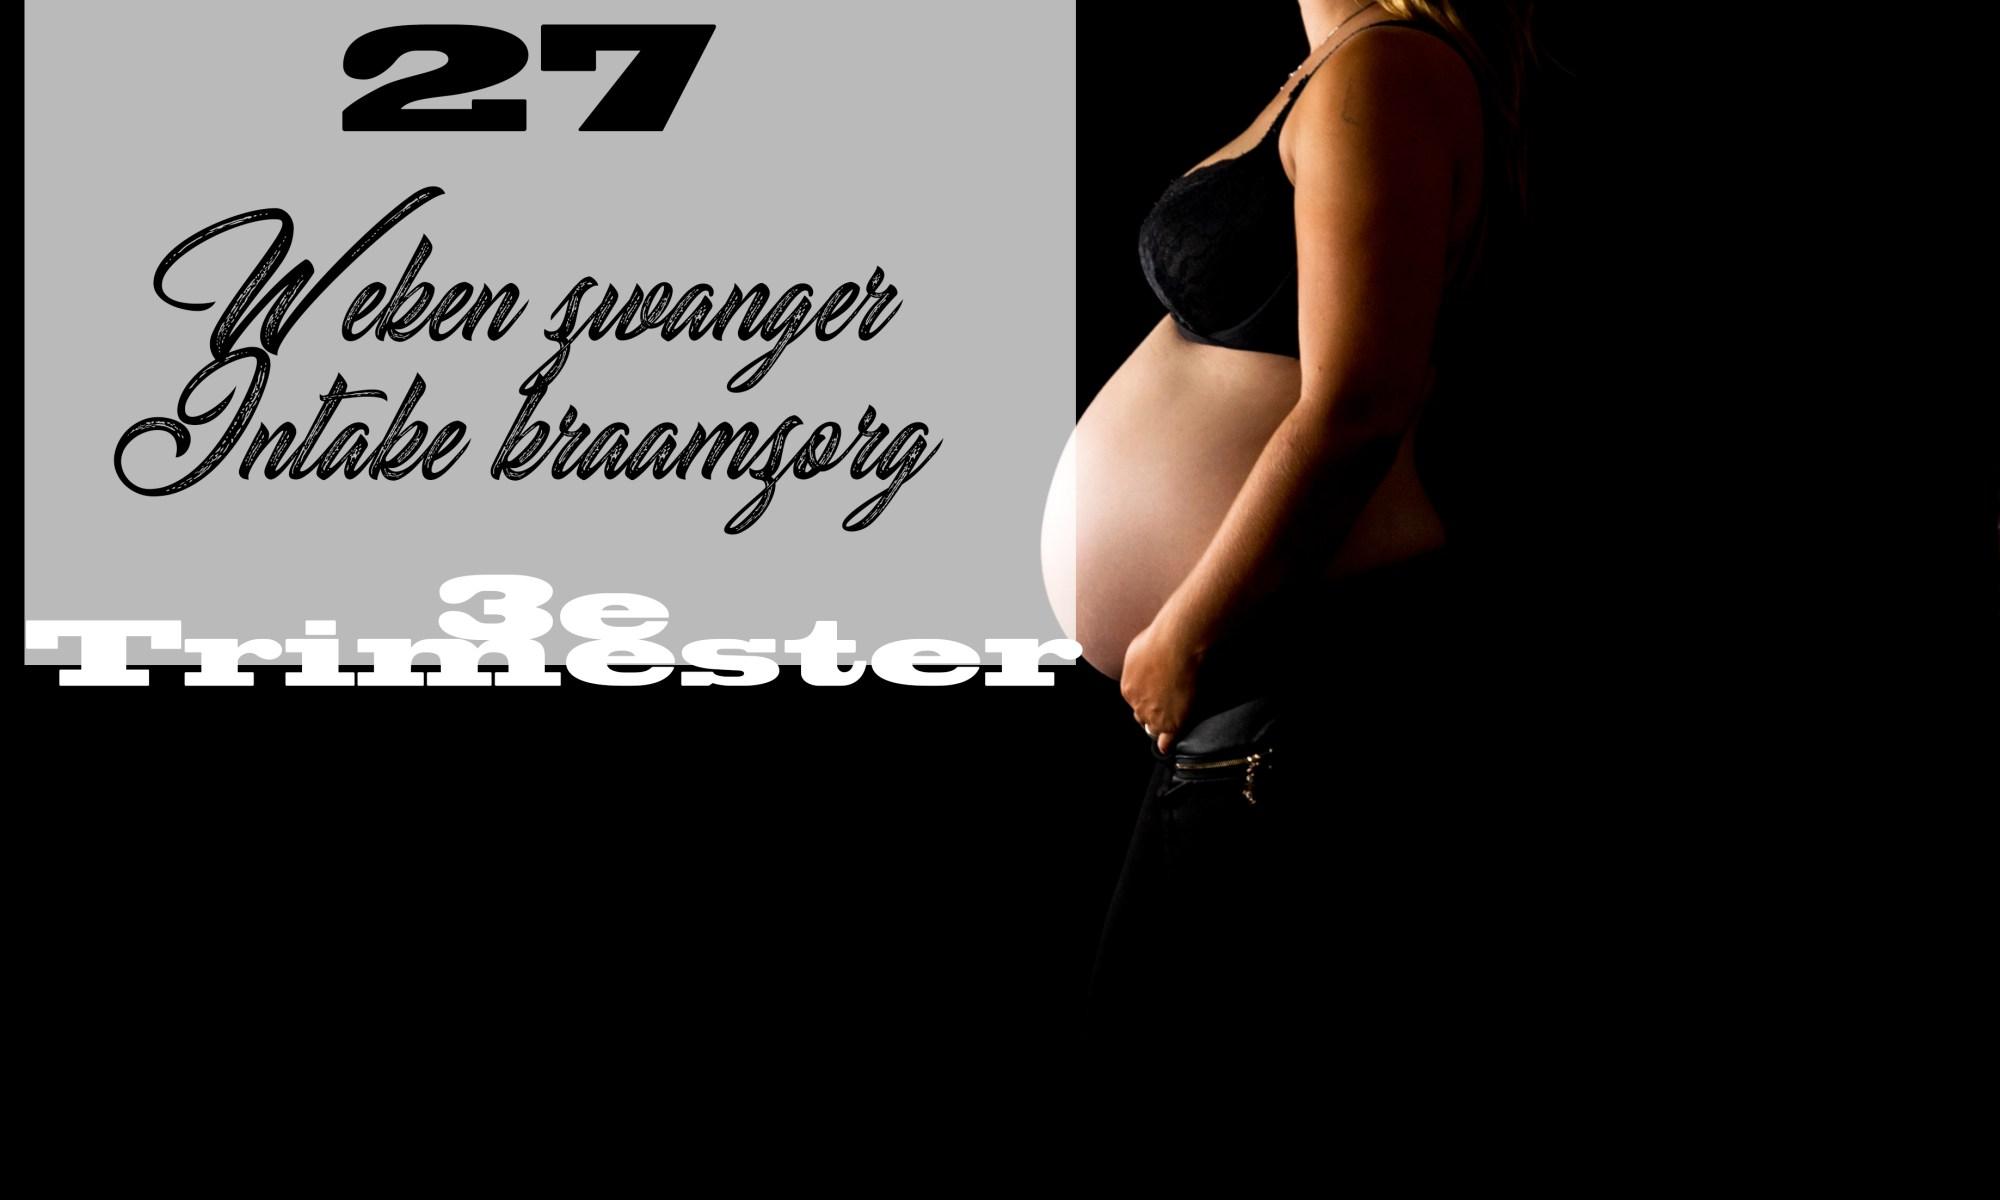 27 weken zwanger buikfoto 27 weken zwangerschap mama blog kwaaltjes intake kraamzorg 3e trimester www.liefkleinwonder.nl